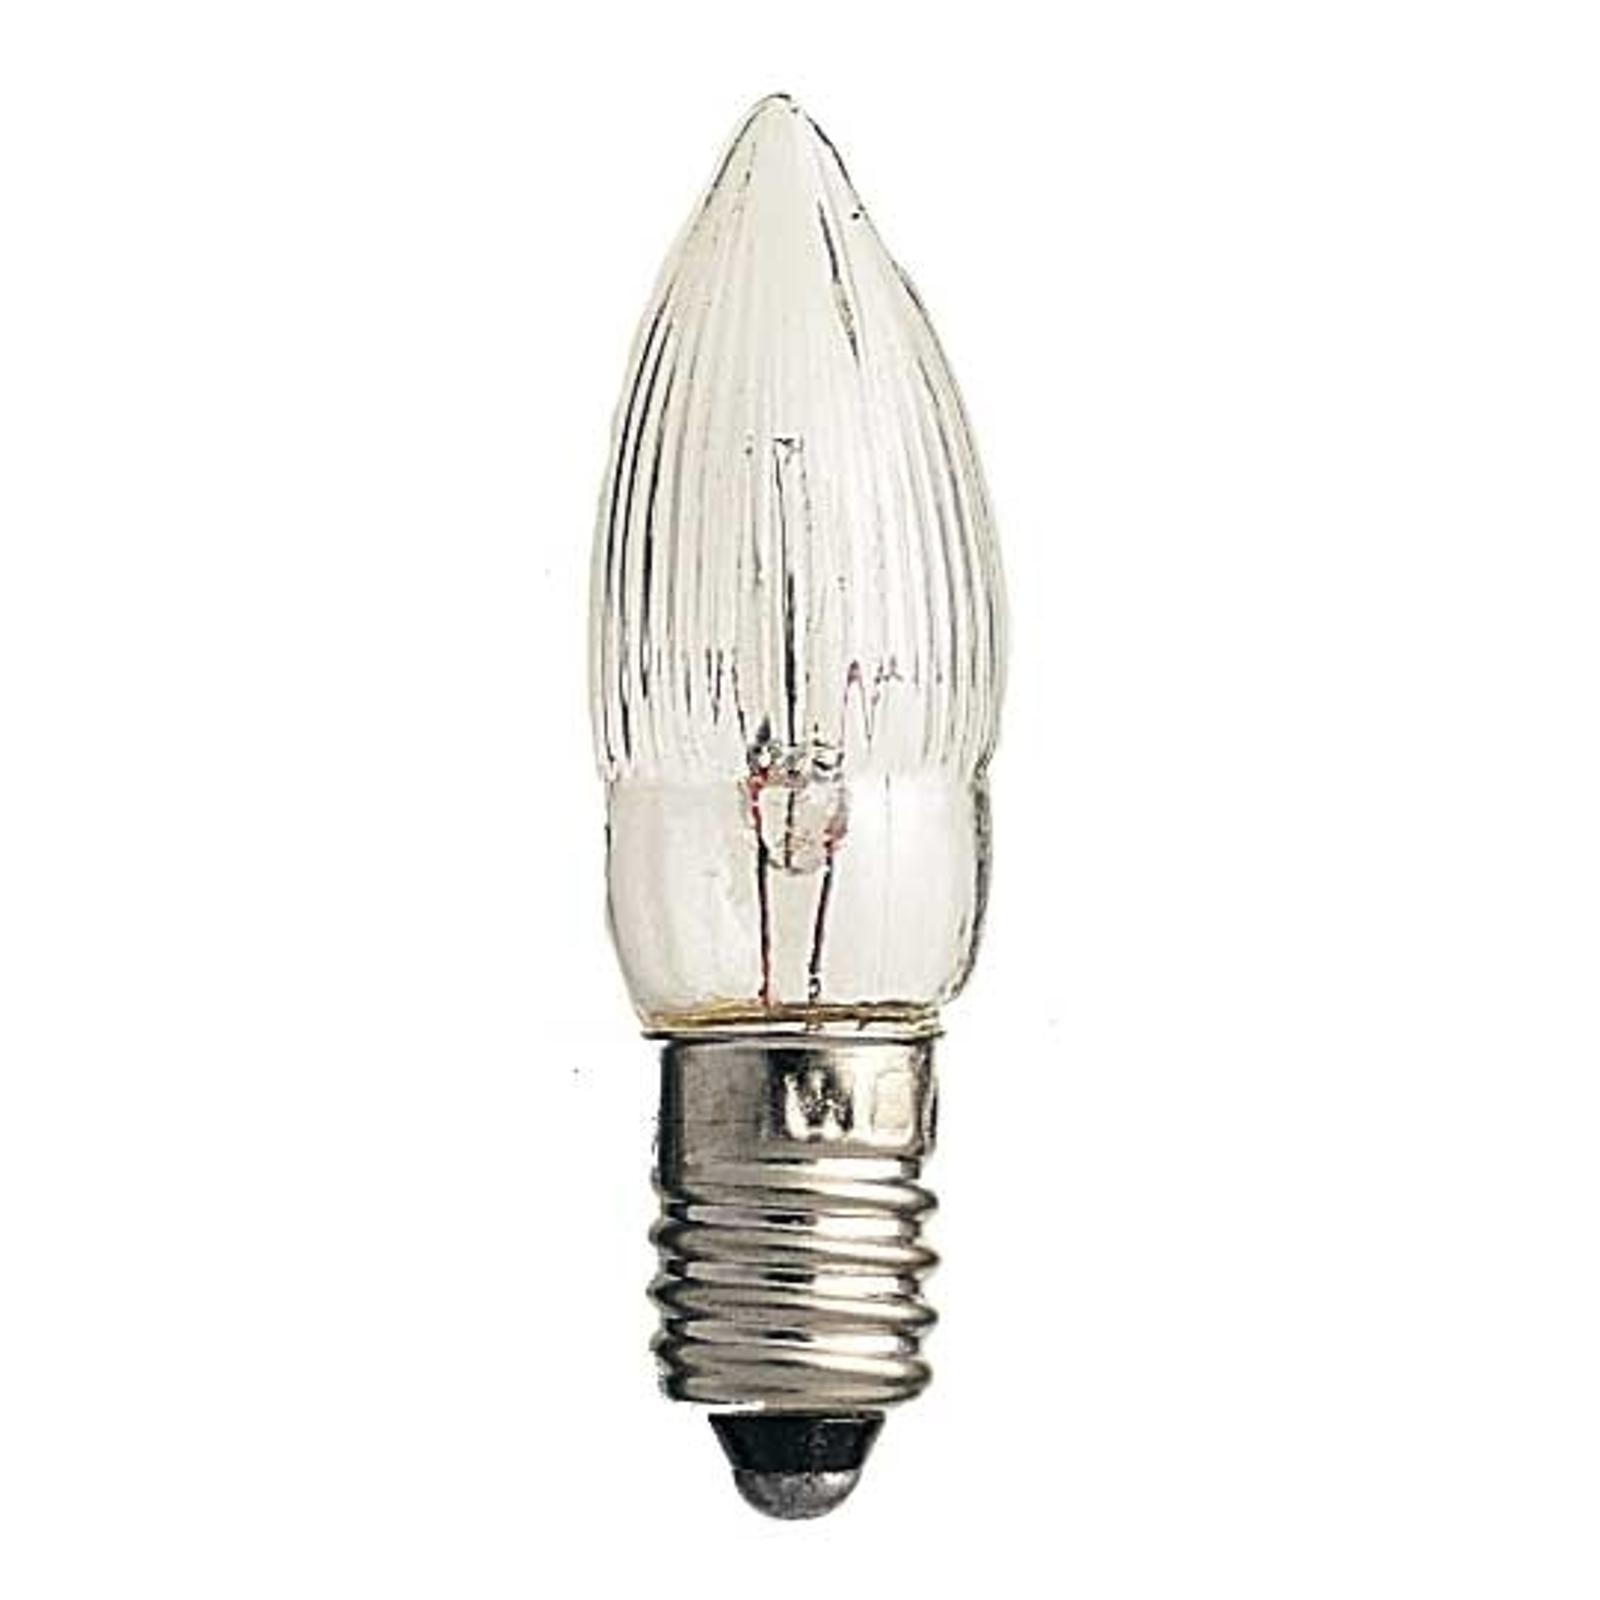 E10 3W 14V Varalamput 3kpl kynttilänmuotoiset